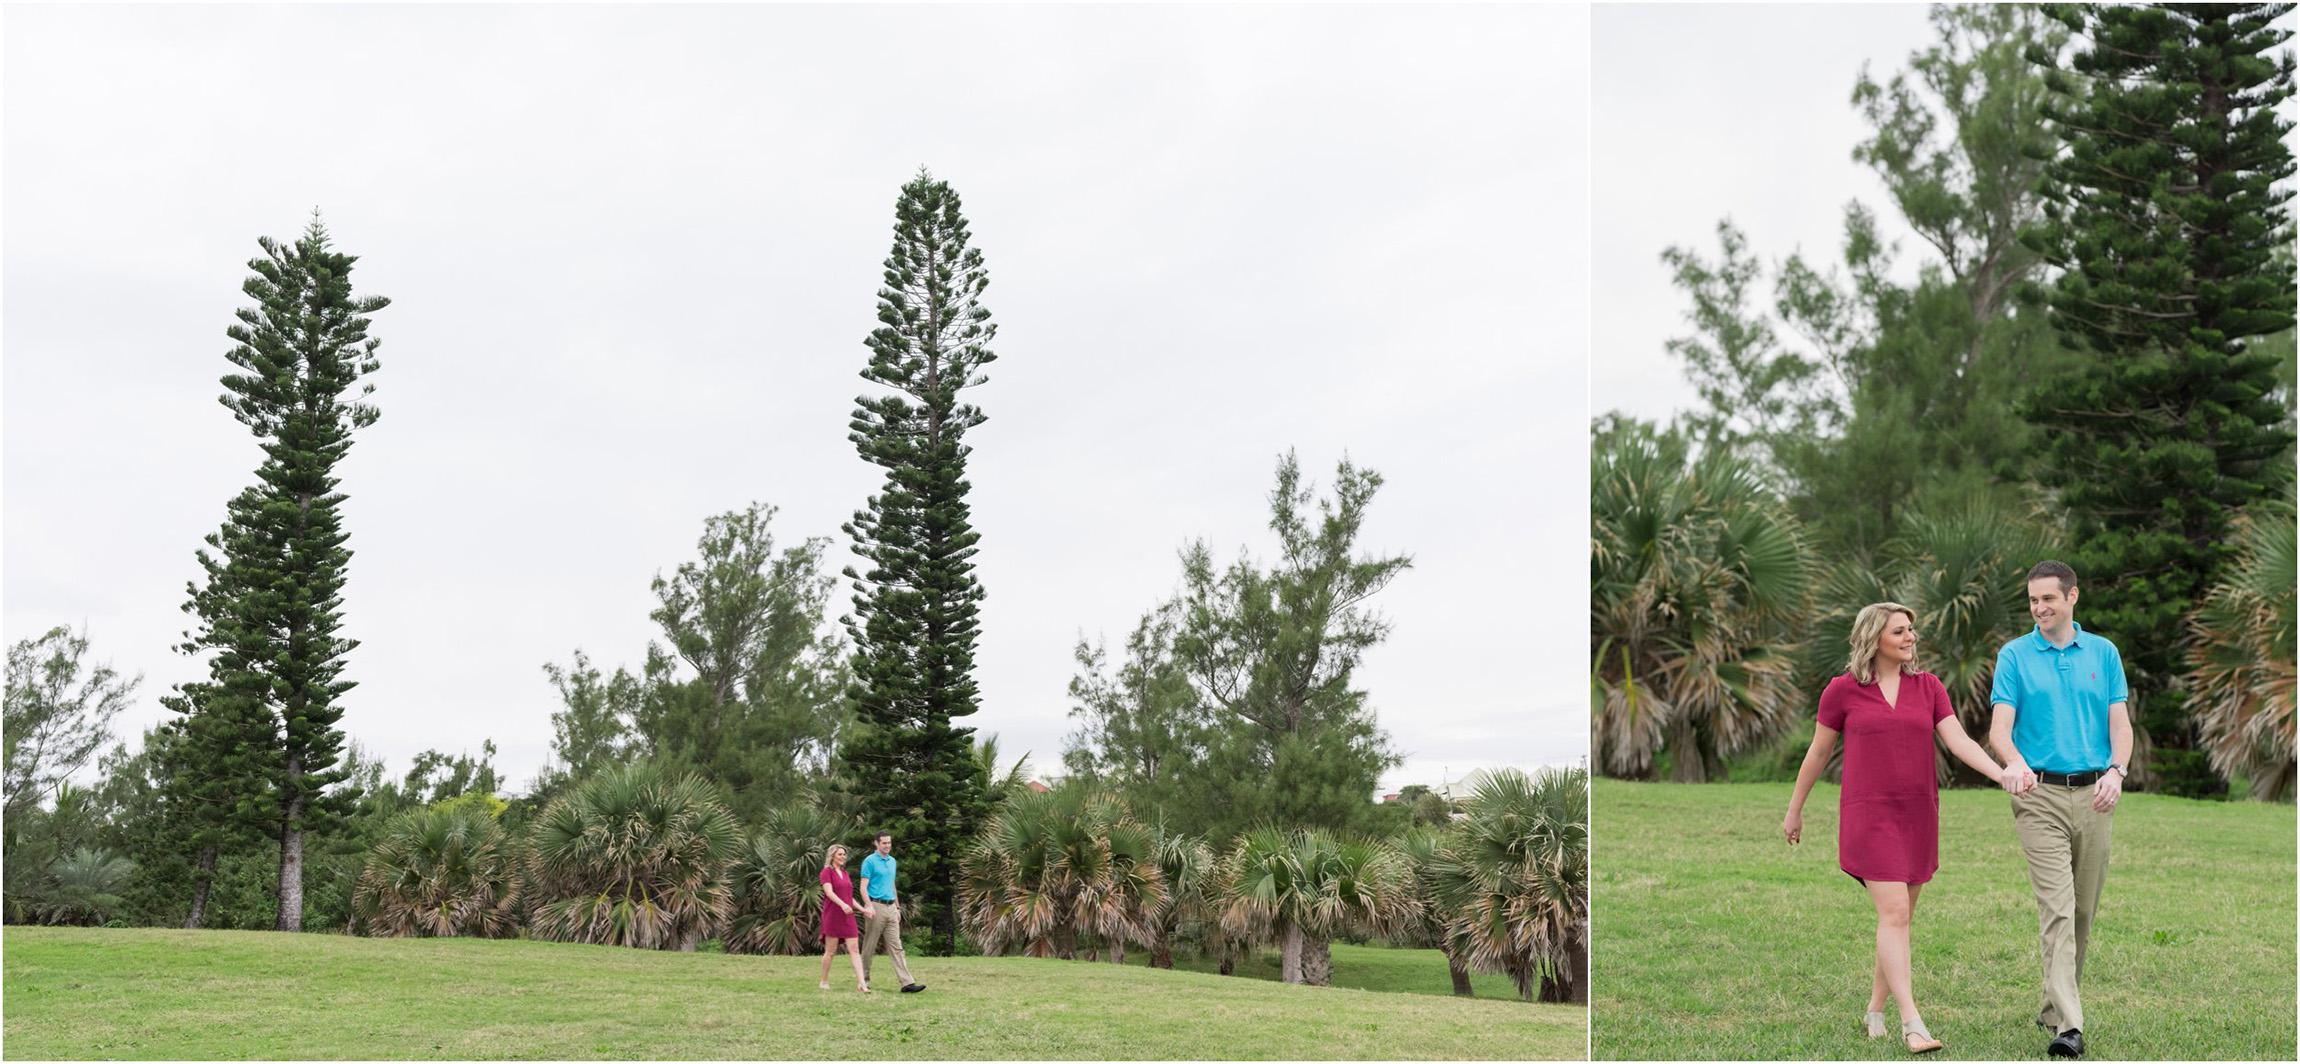 ©FianderFoto_Bermuda Photographer_Astwood Park_Vanessa_Kevin_010.jpg